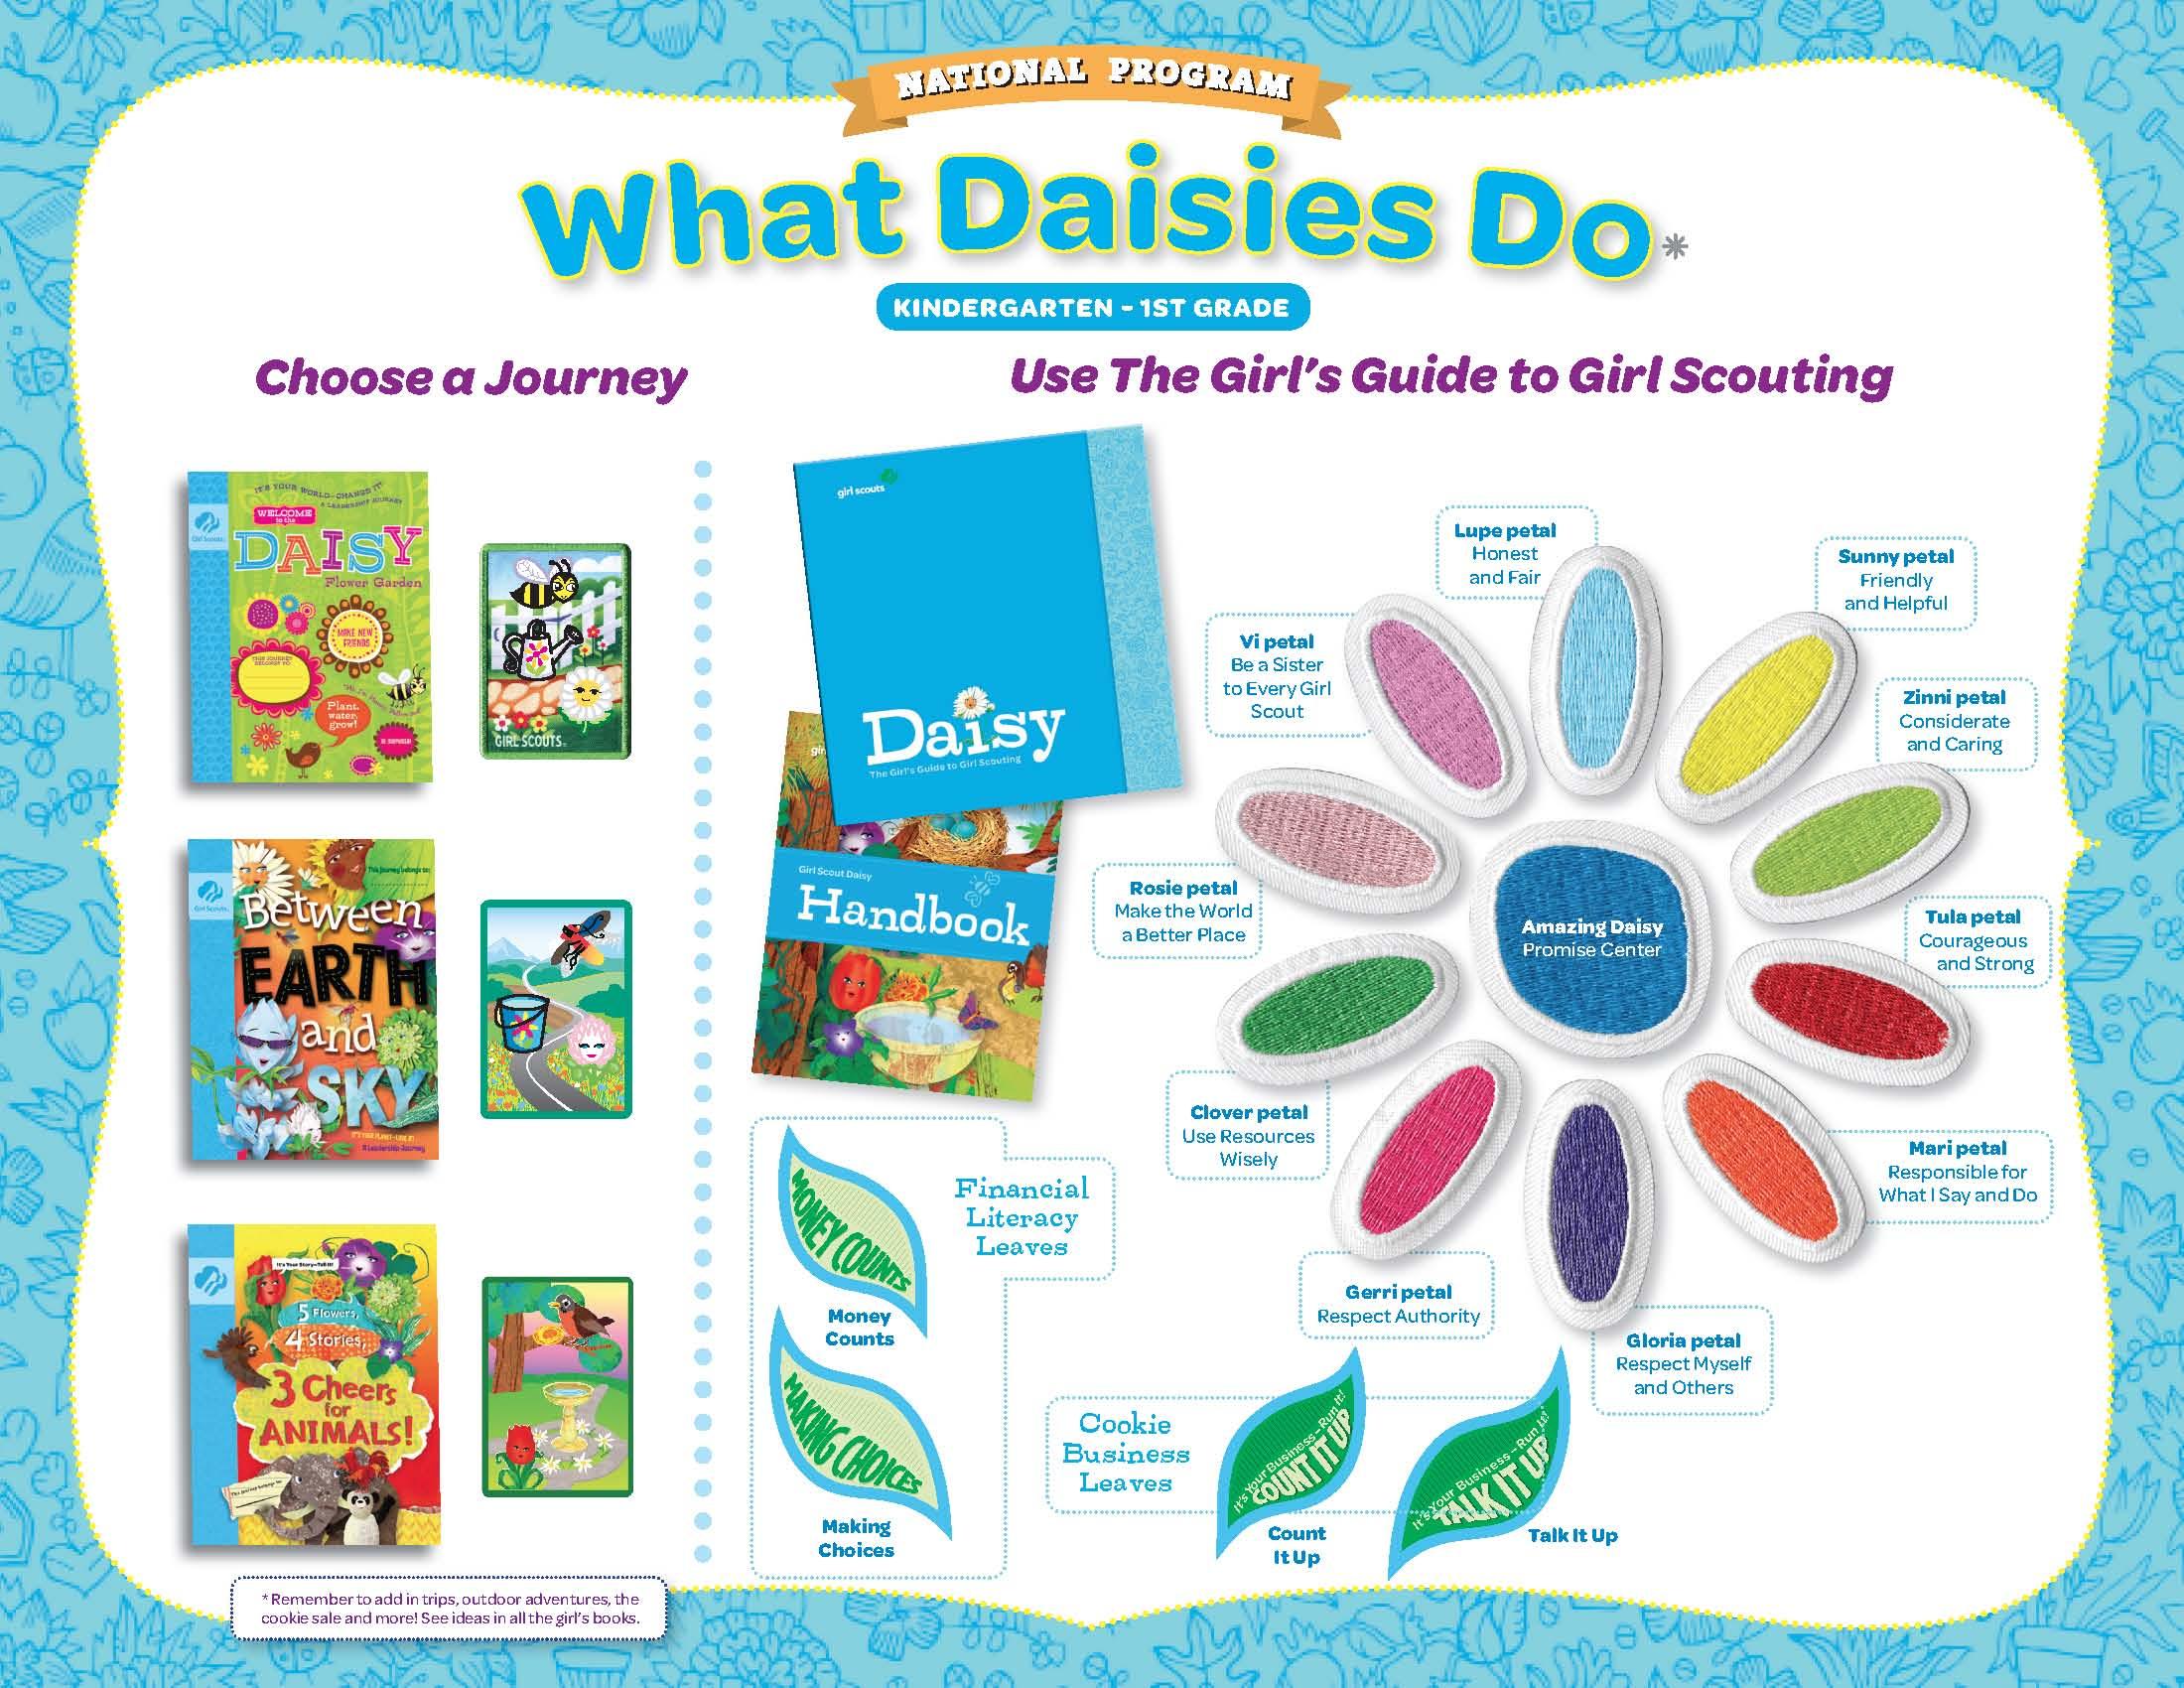 What Girls Do - Daisies